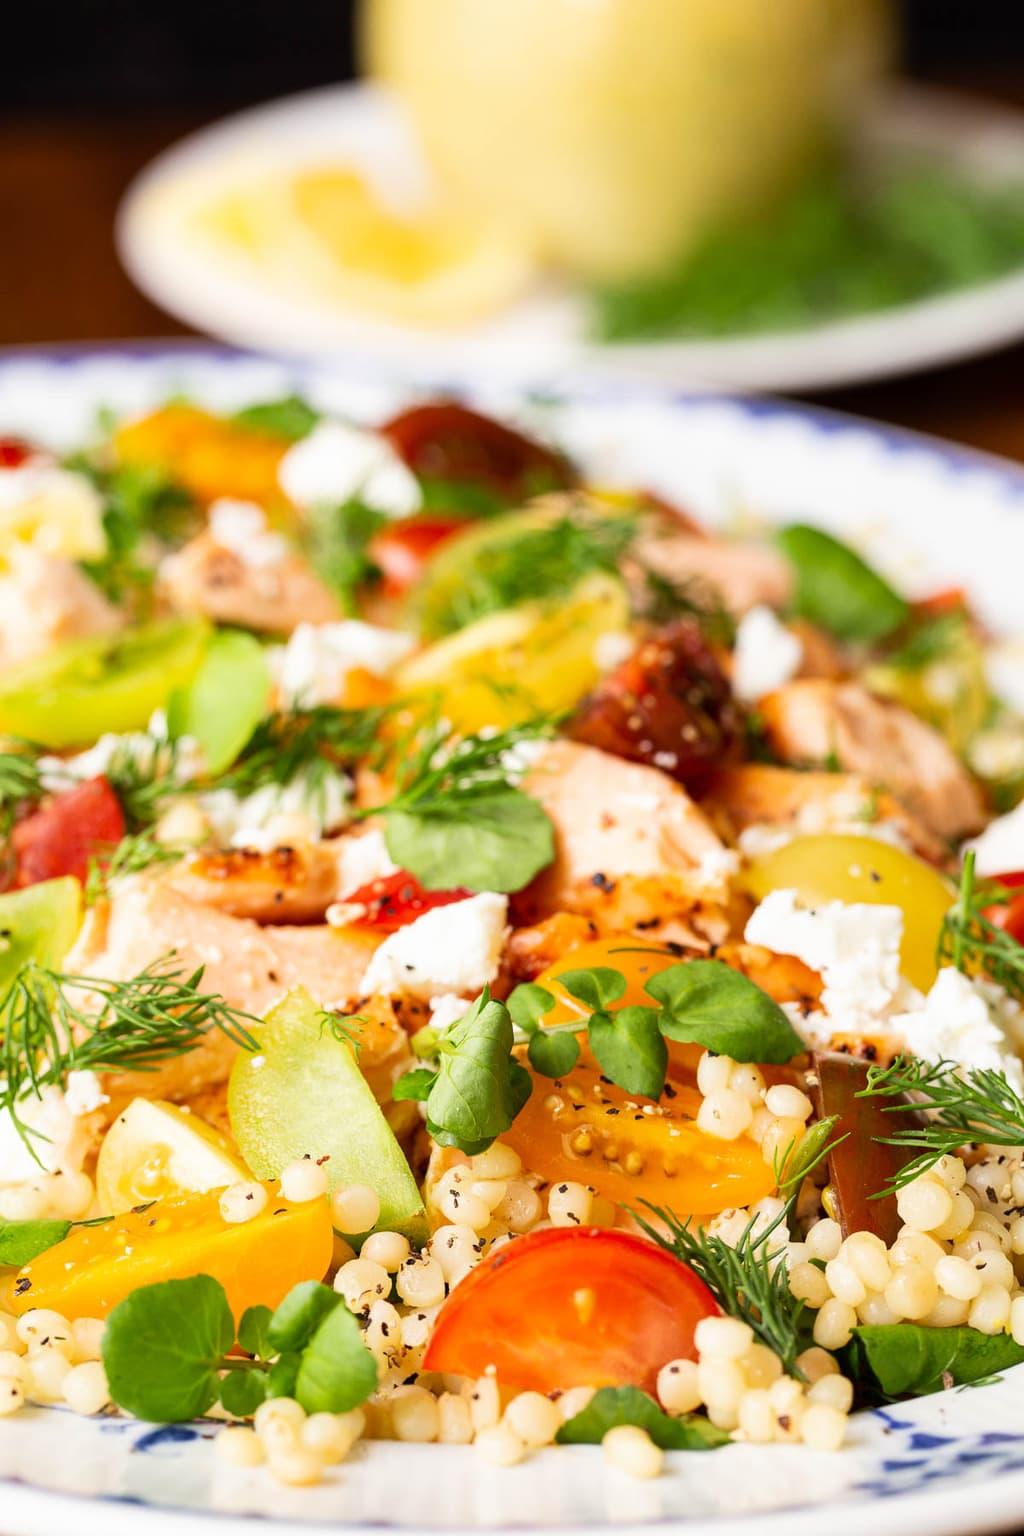 Vertical closeup photo of a presentation platter of Israeli Couscous Salmon Salad.